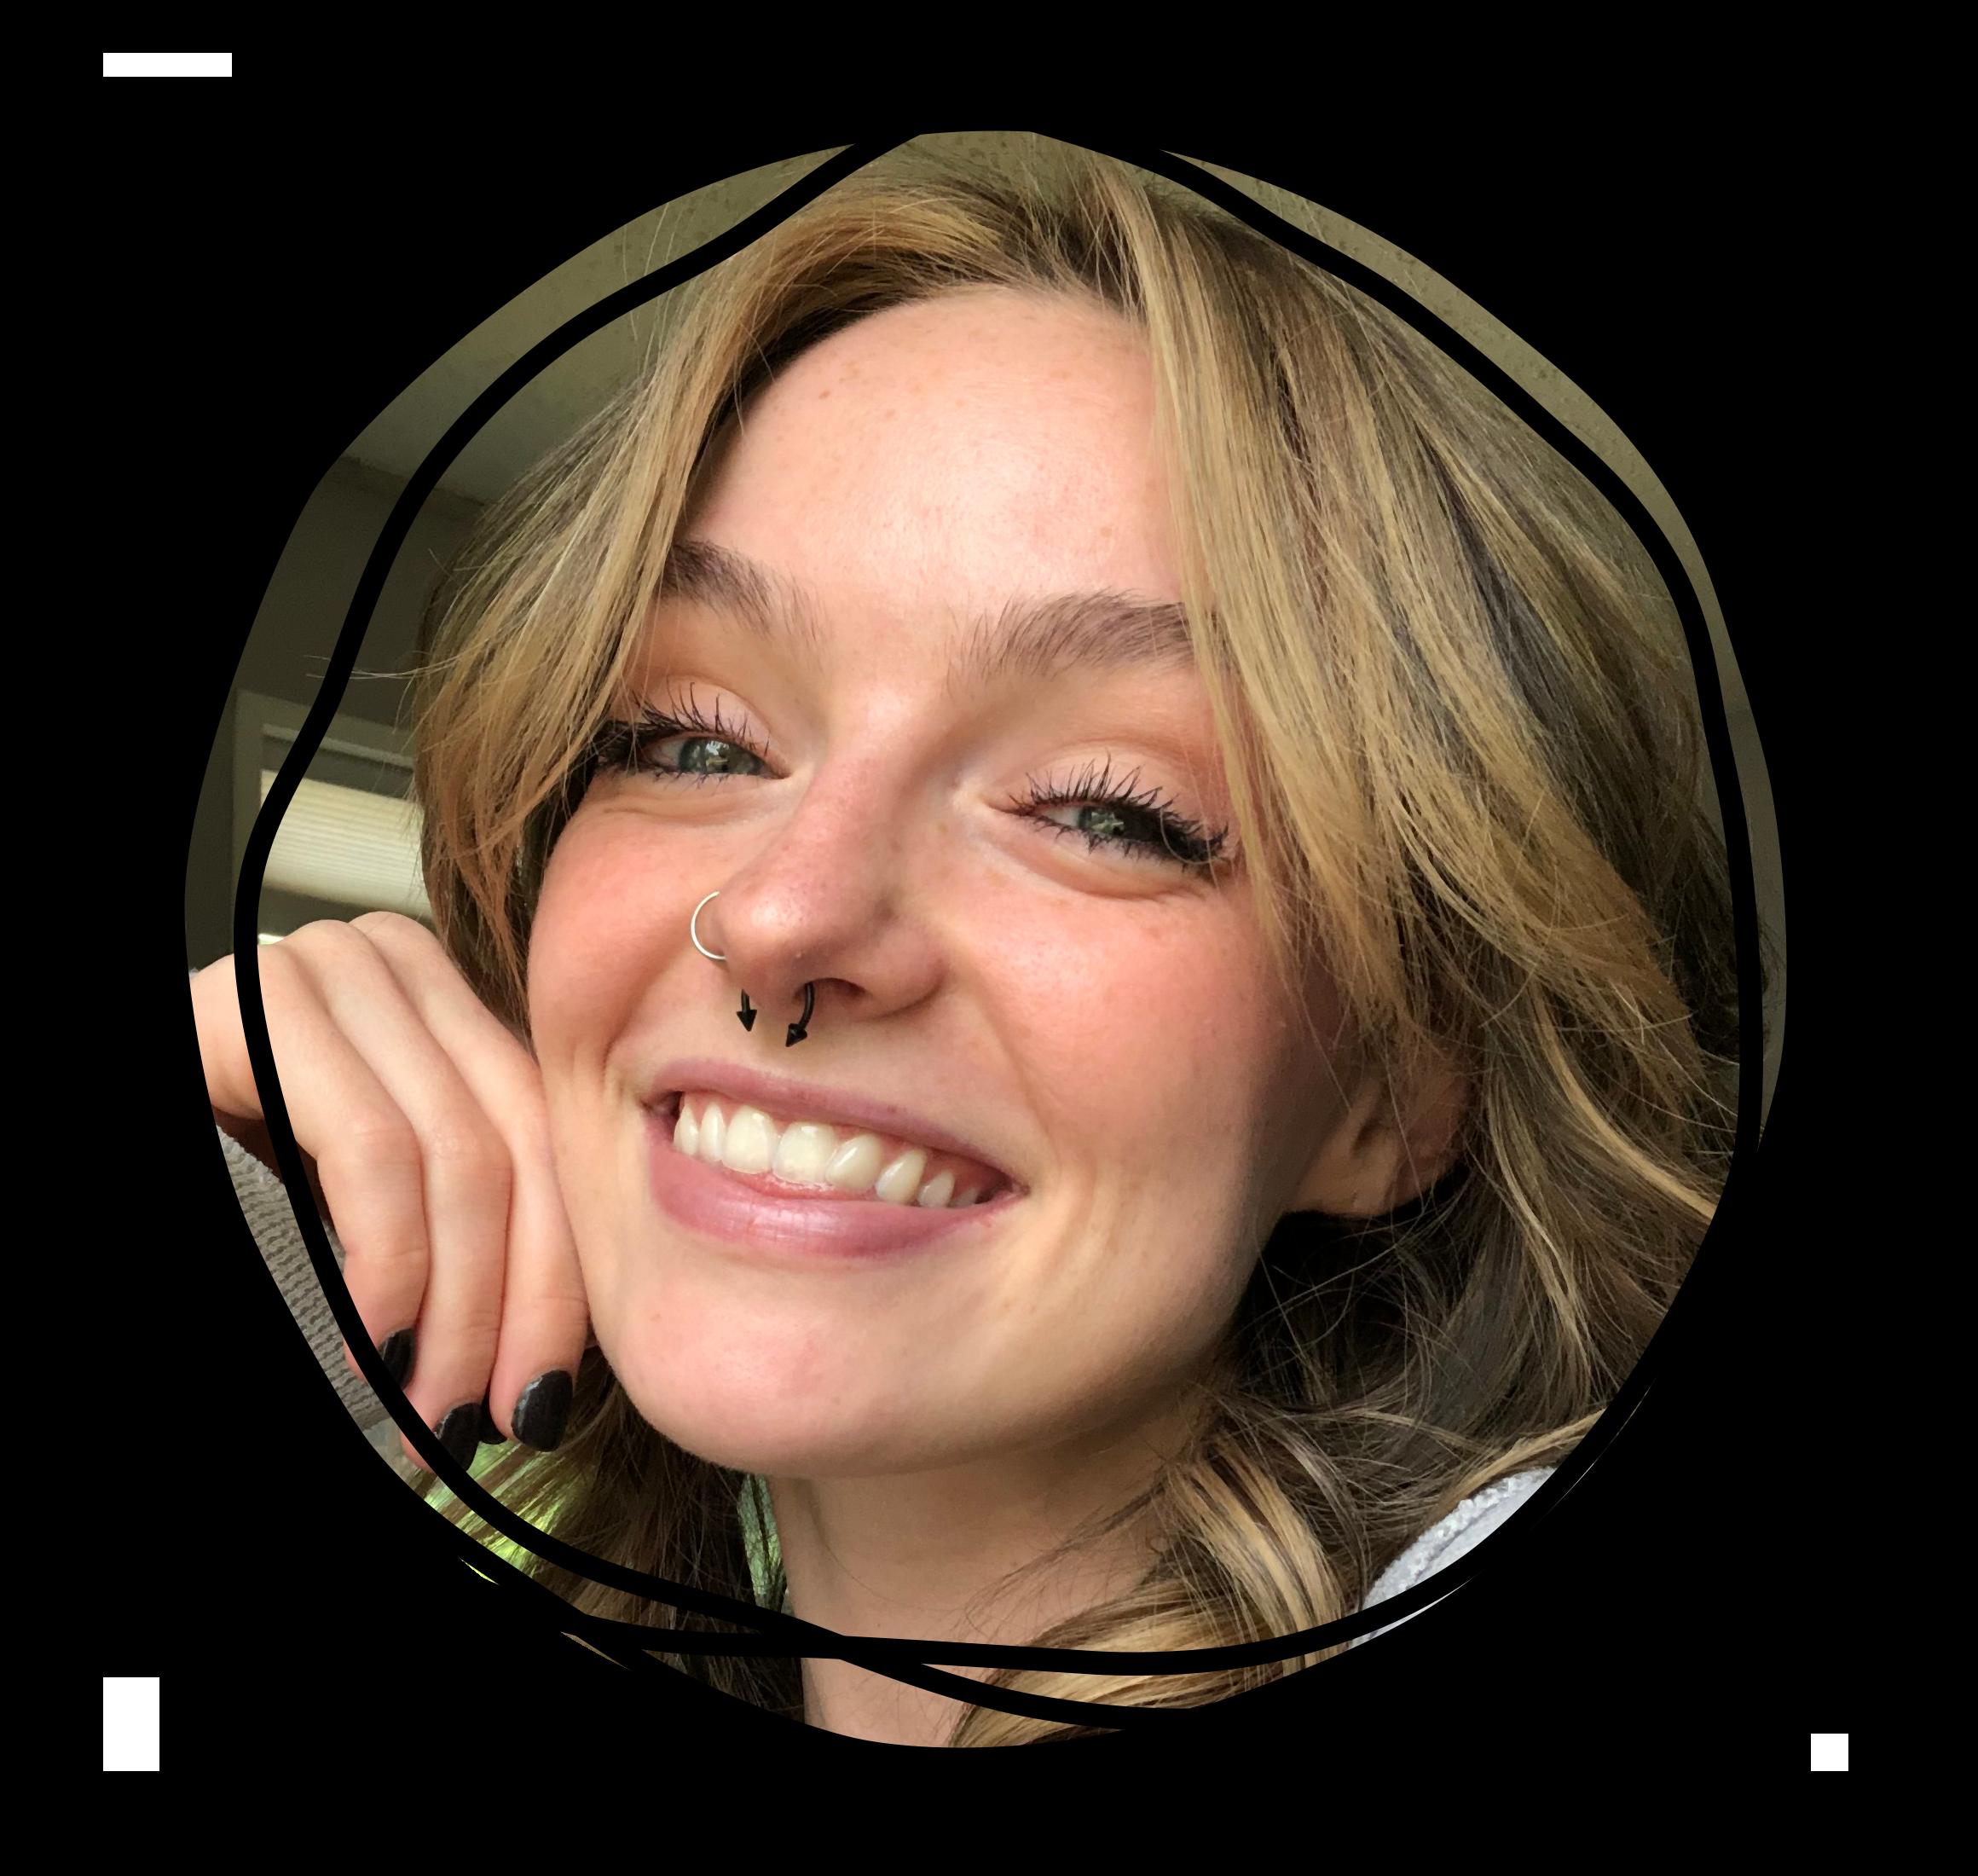 rosieresumes.com profile pic